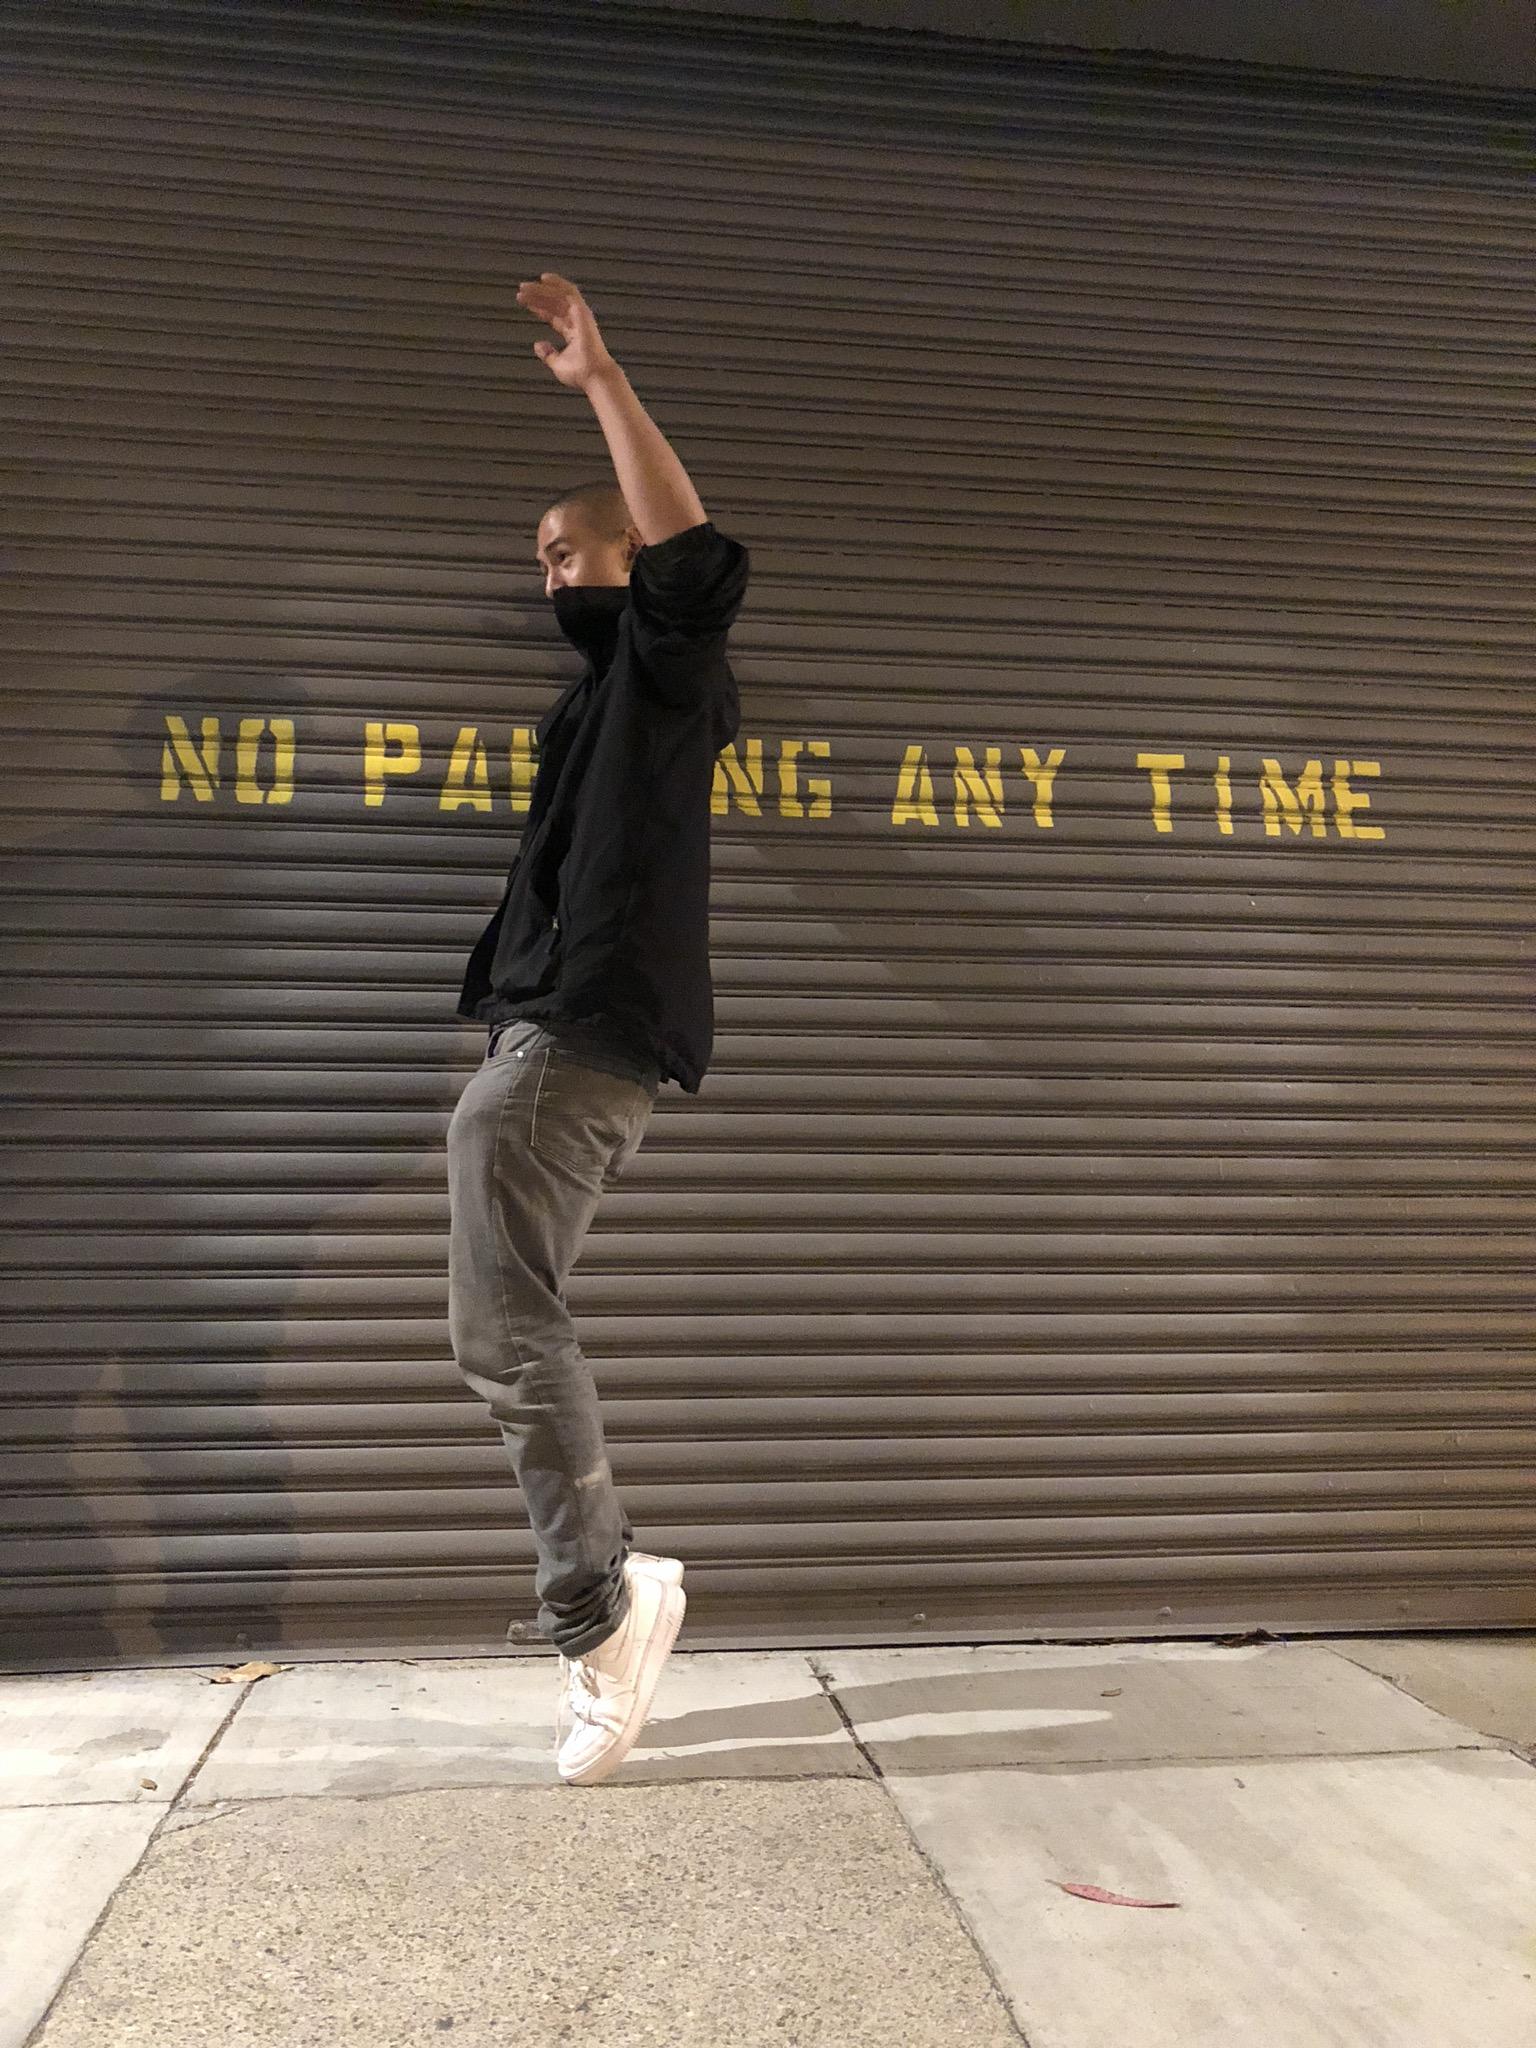 energetic dance toe freeze on nite sidewalk